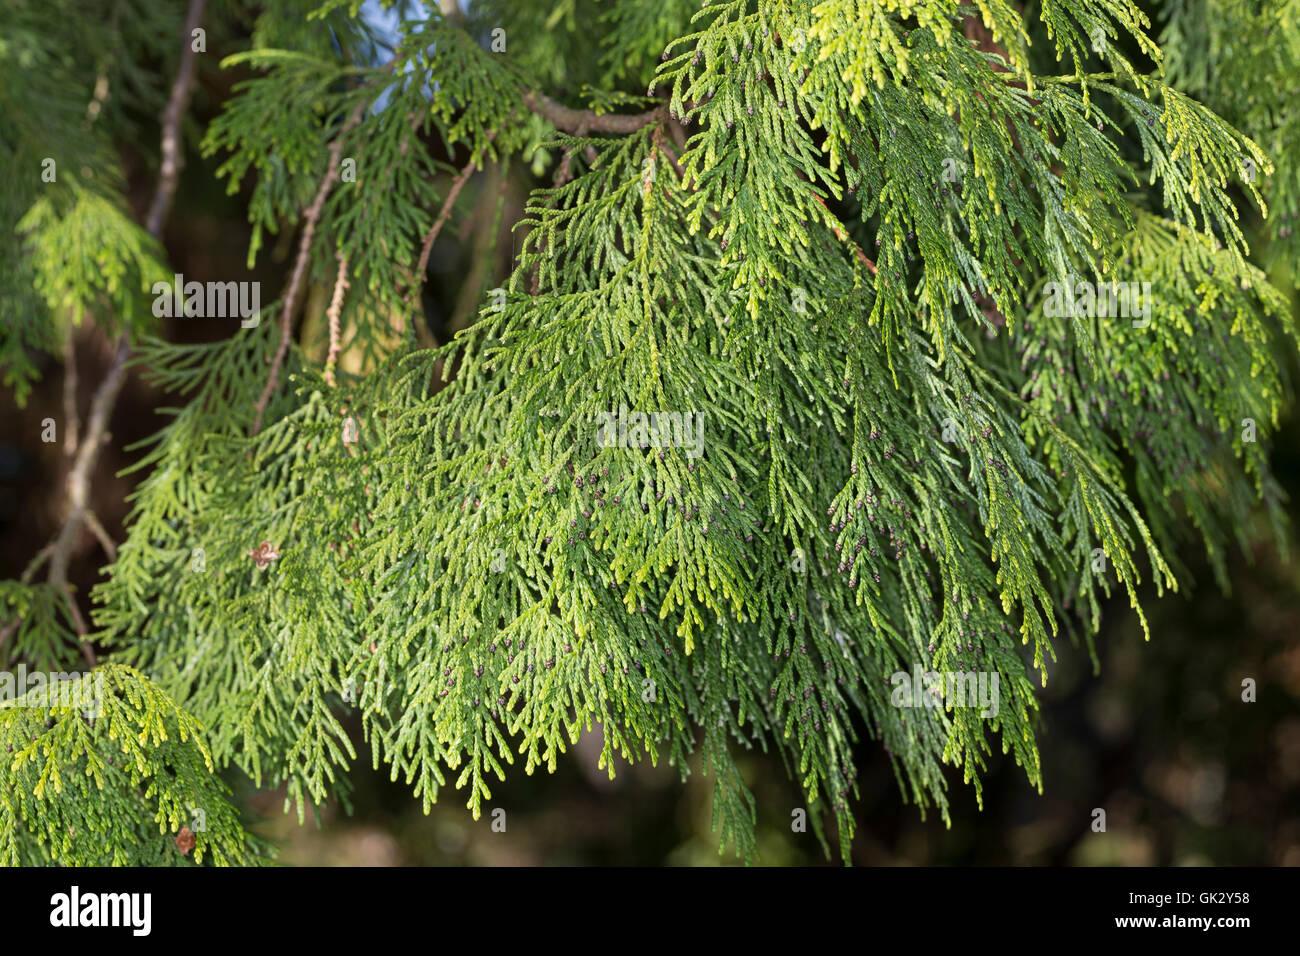 Japanischer Lebensbaum, Japan-Lebensbaum, Thuja standishii, Japanese Thuja, nezuko, kurobe, Le thuya du Japon - Stock Image